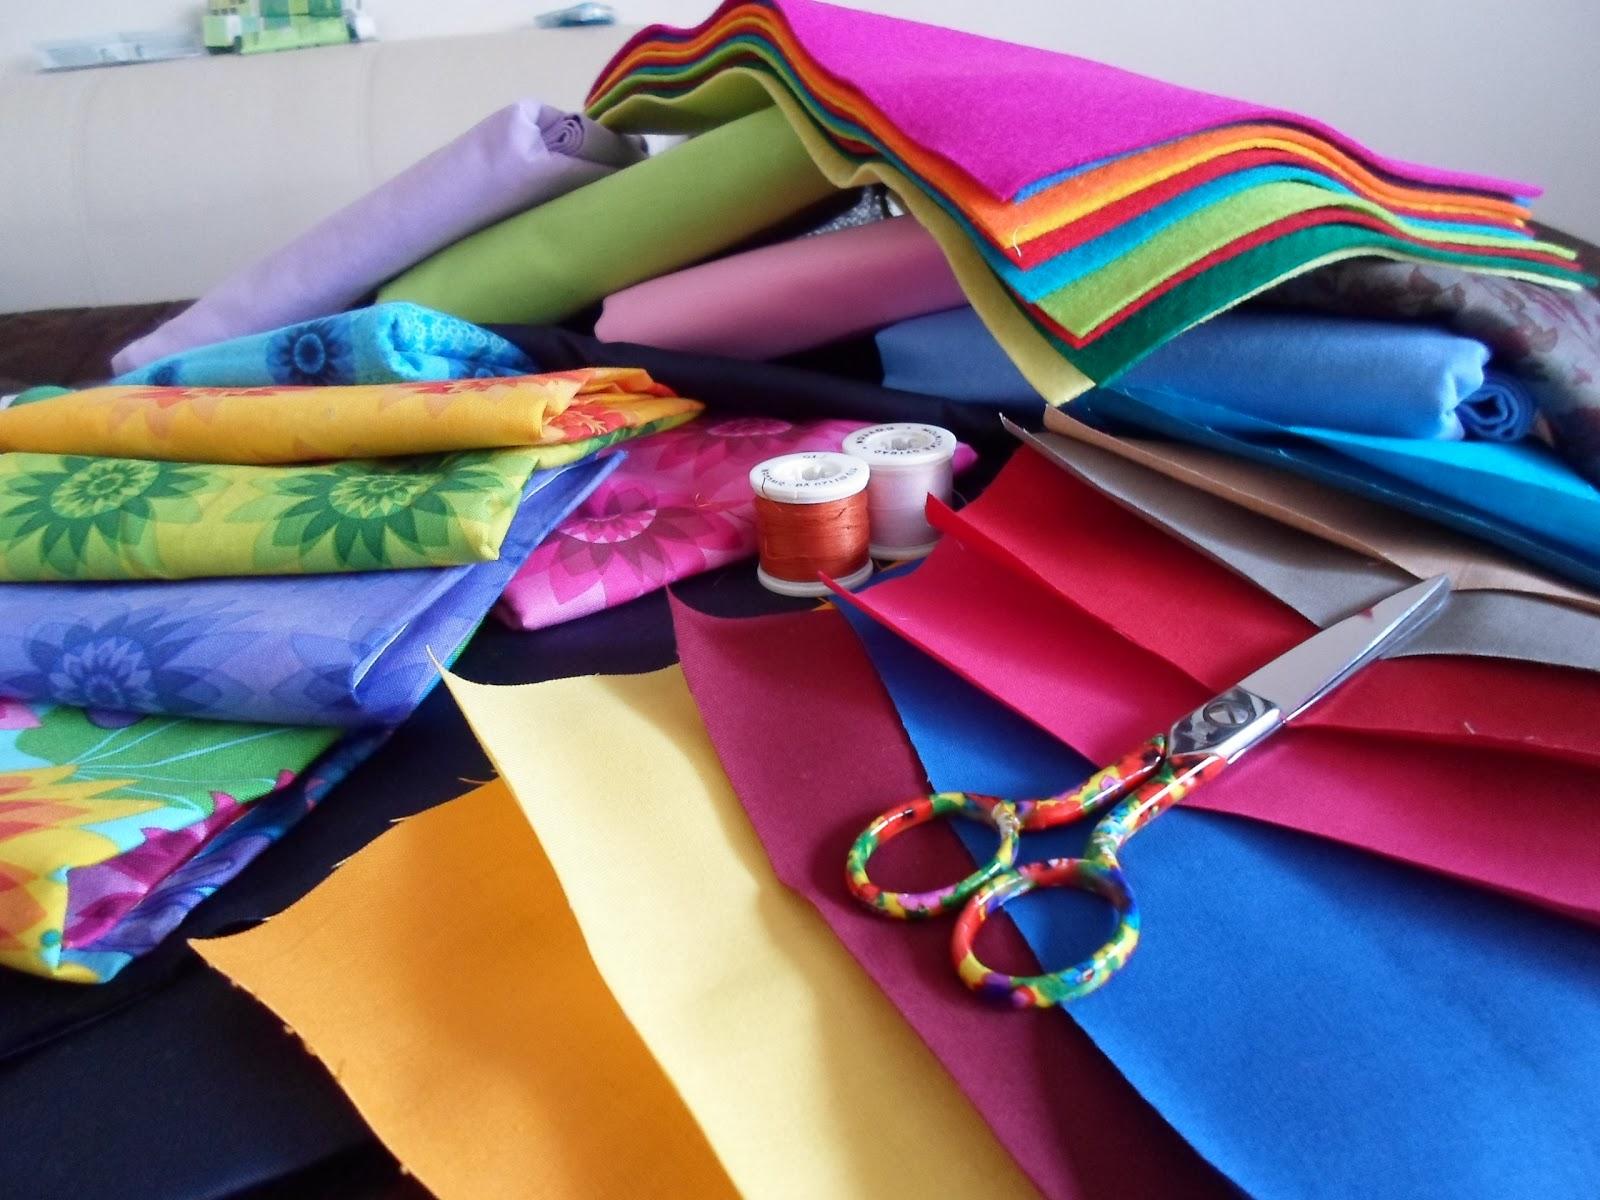 Petachitos a ratitos new cotton fabrics telas nuevas for Telas para visillos de salon